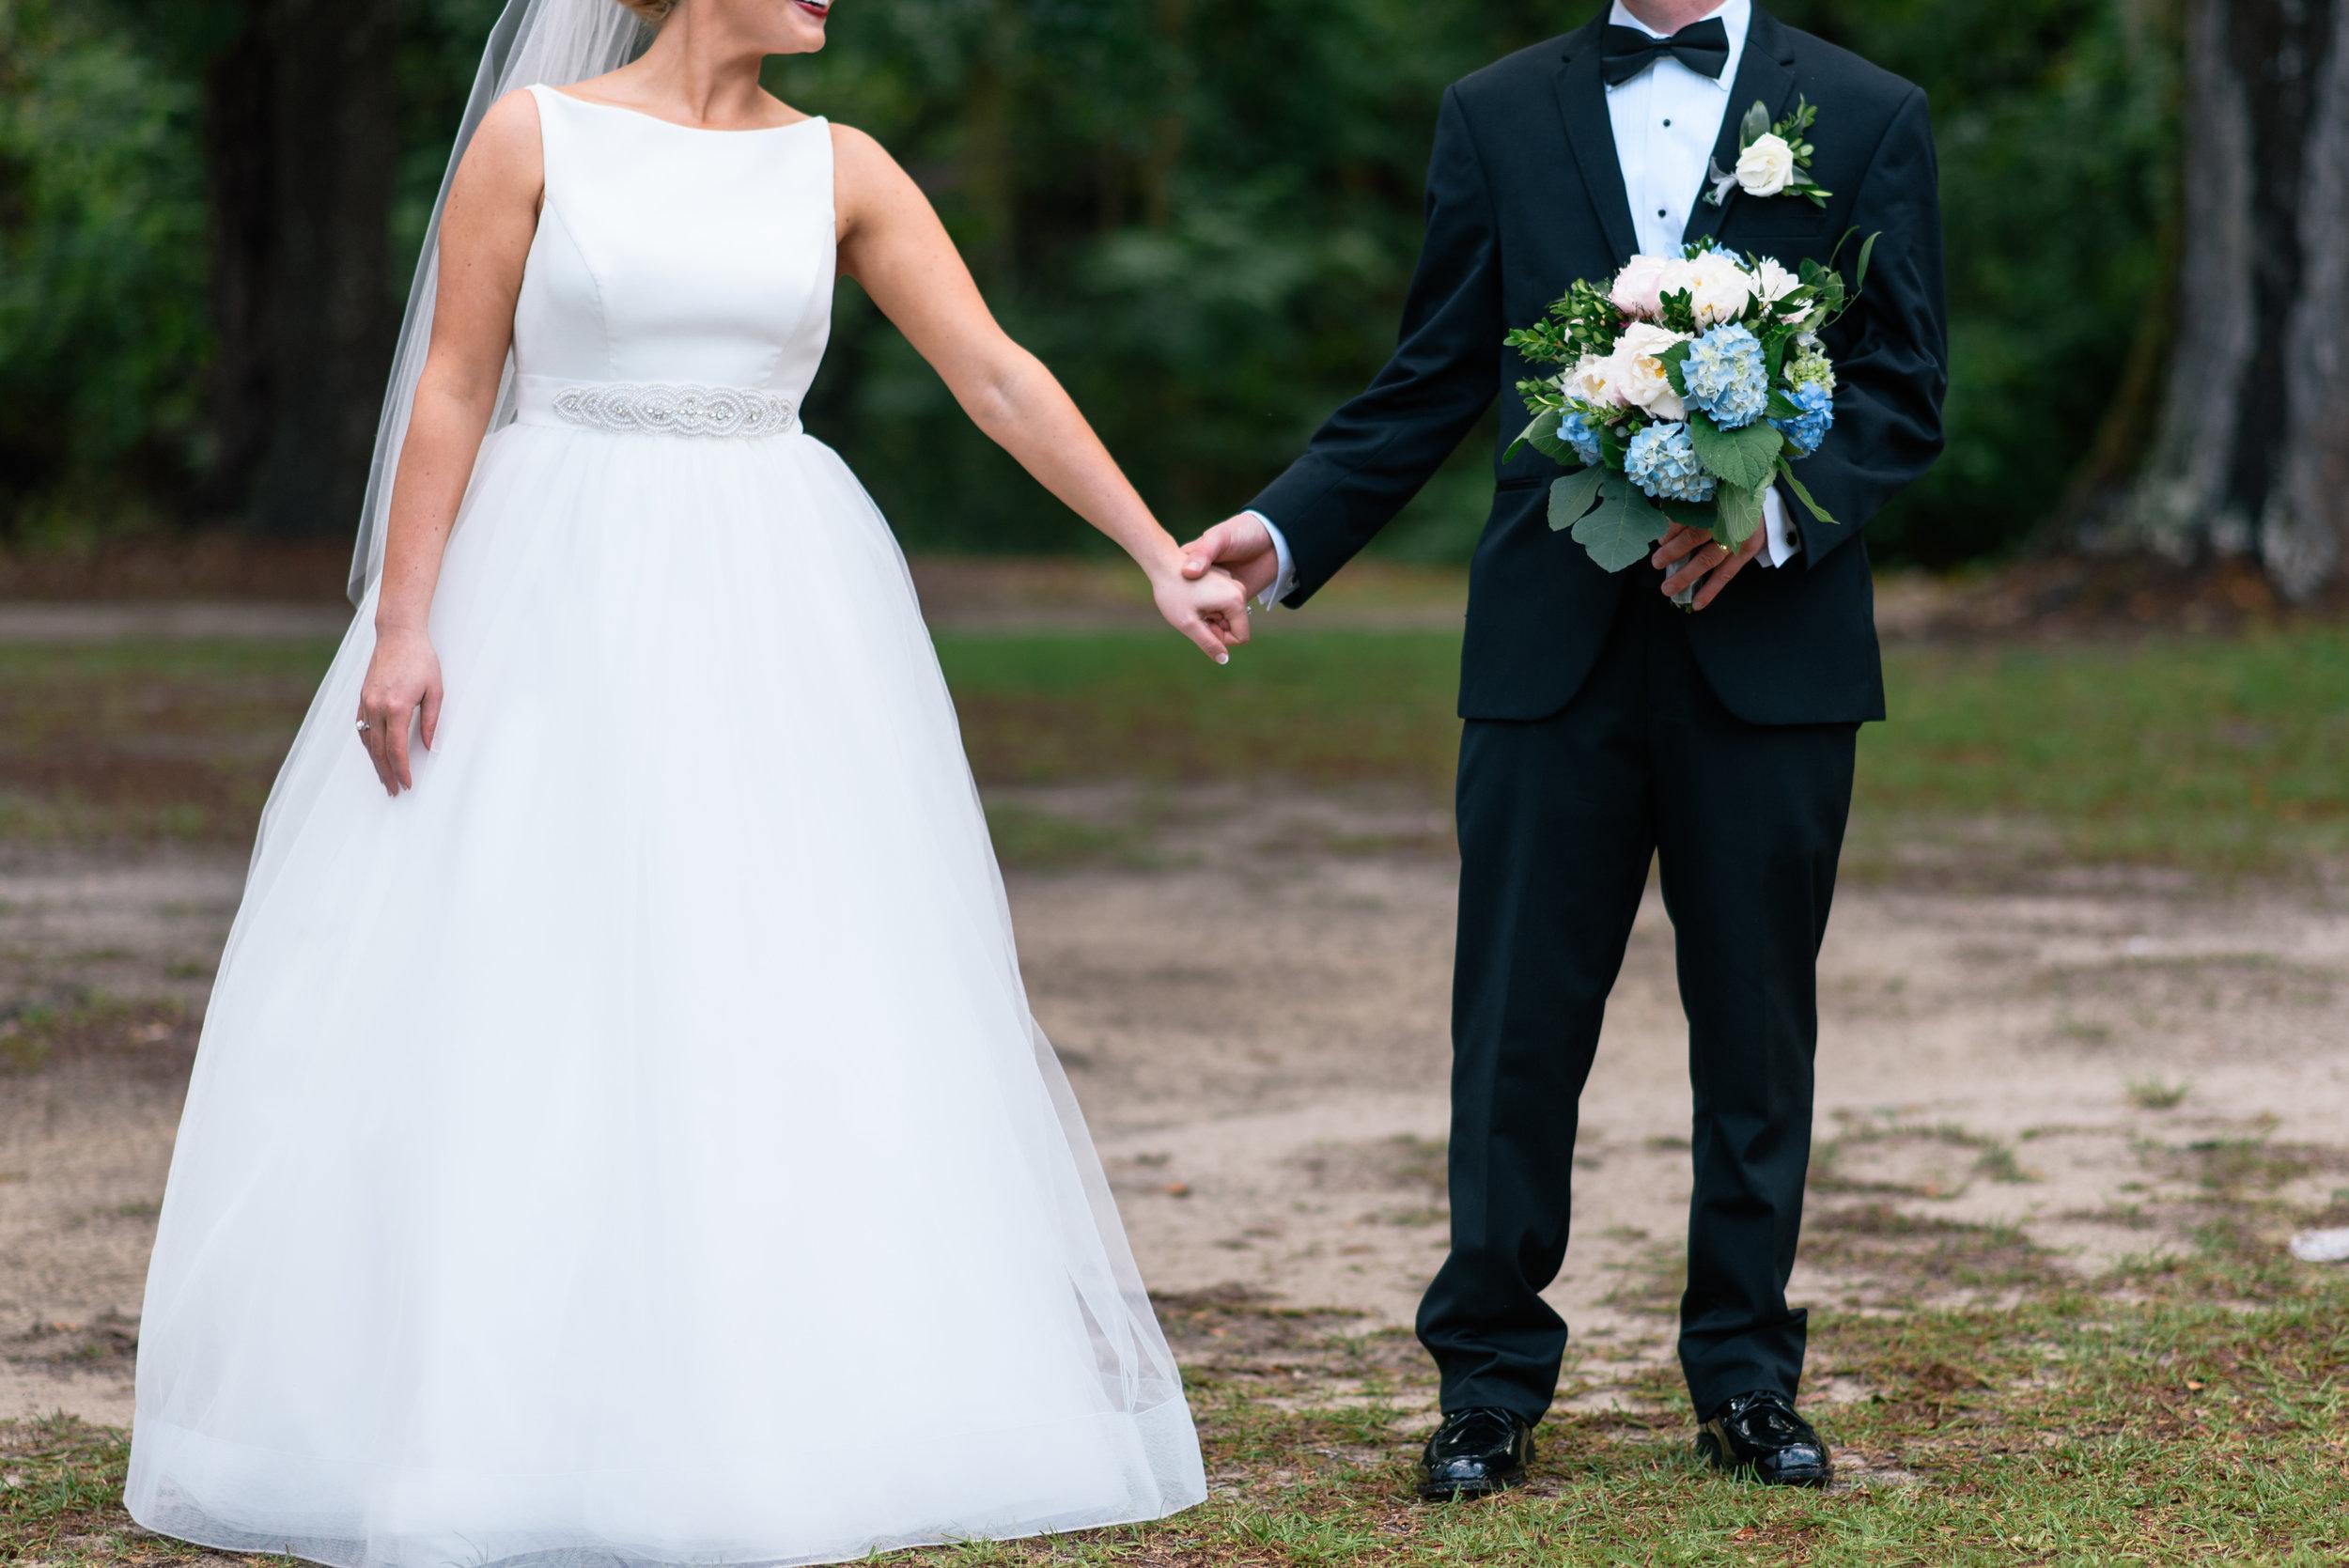 ali-and-jared-savannah-georgia-may-2017-wedding-meg-hill-photo-(481of760).jpg